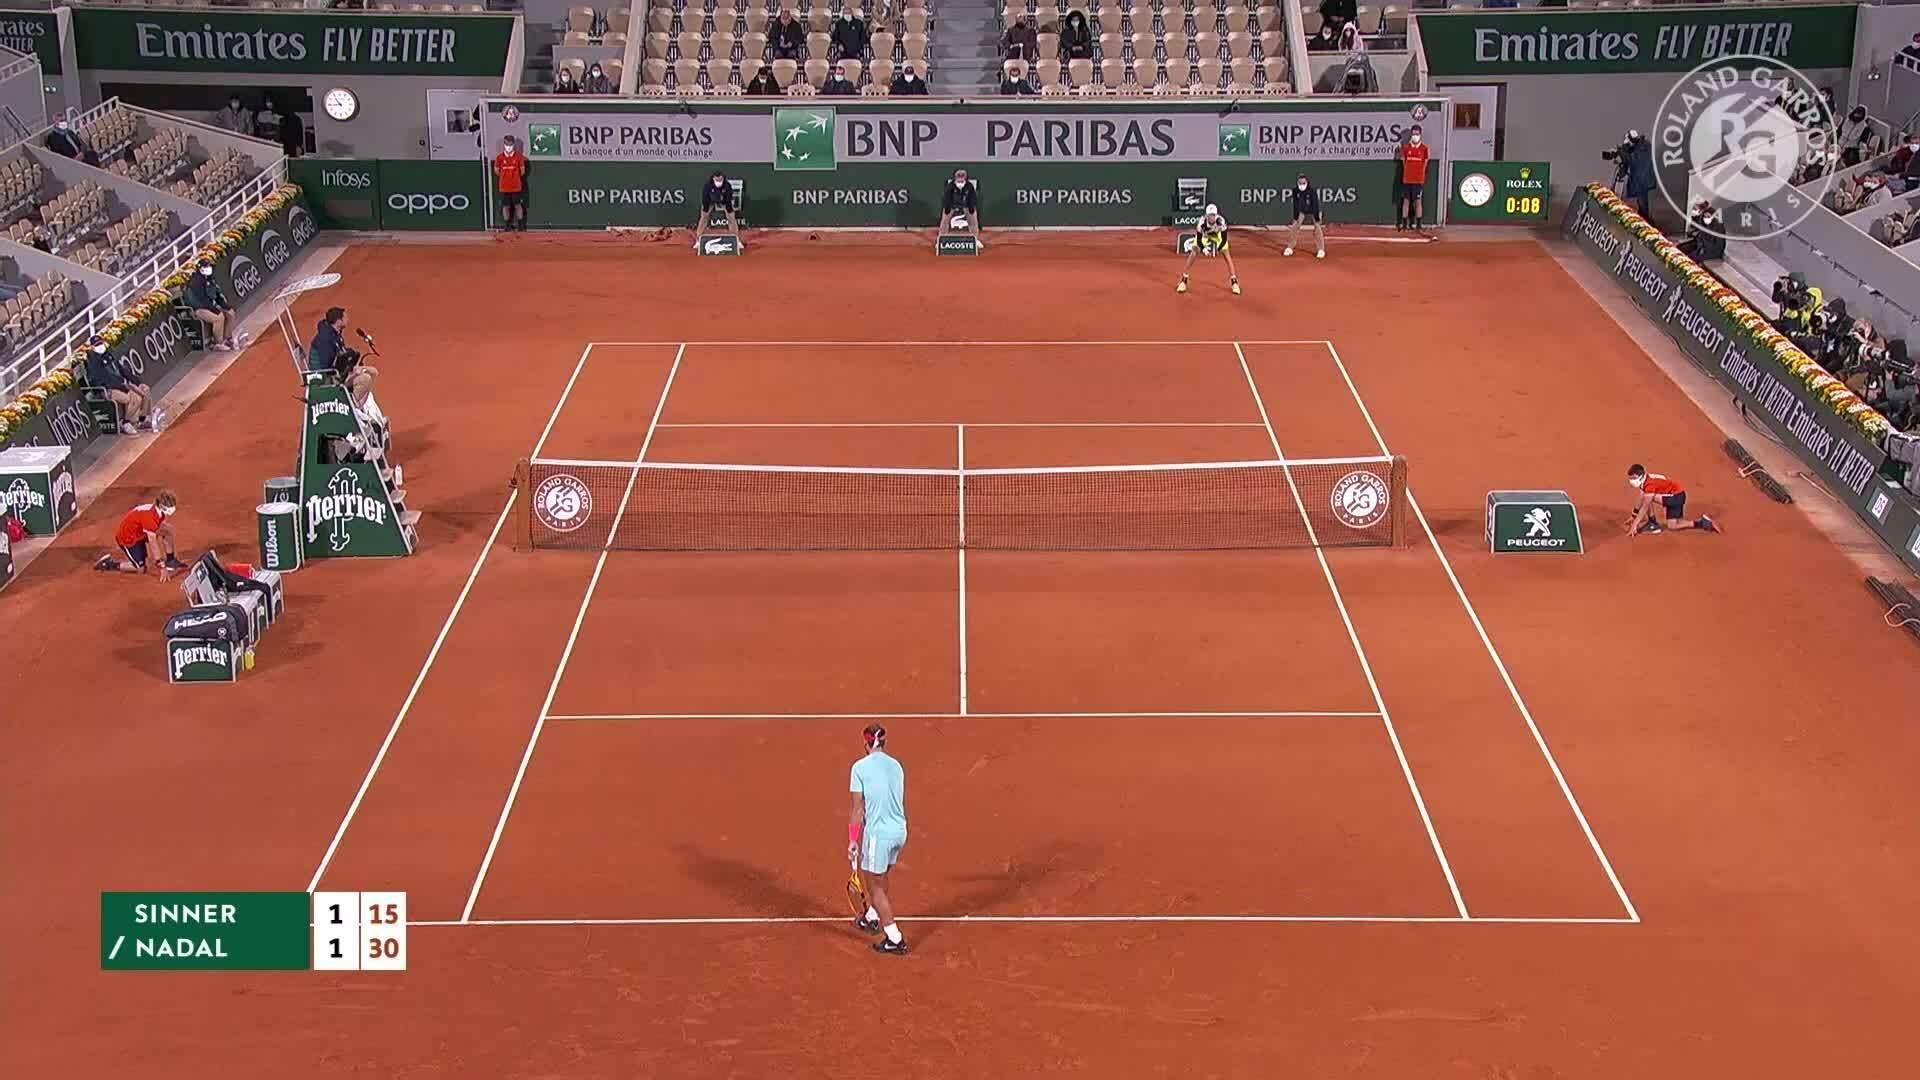 Rafael Nadal 3-0 Jannik Sinner